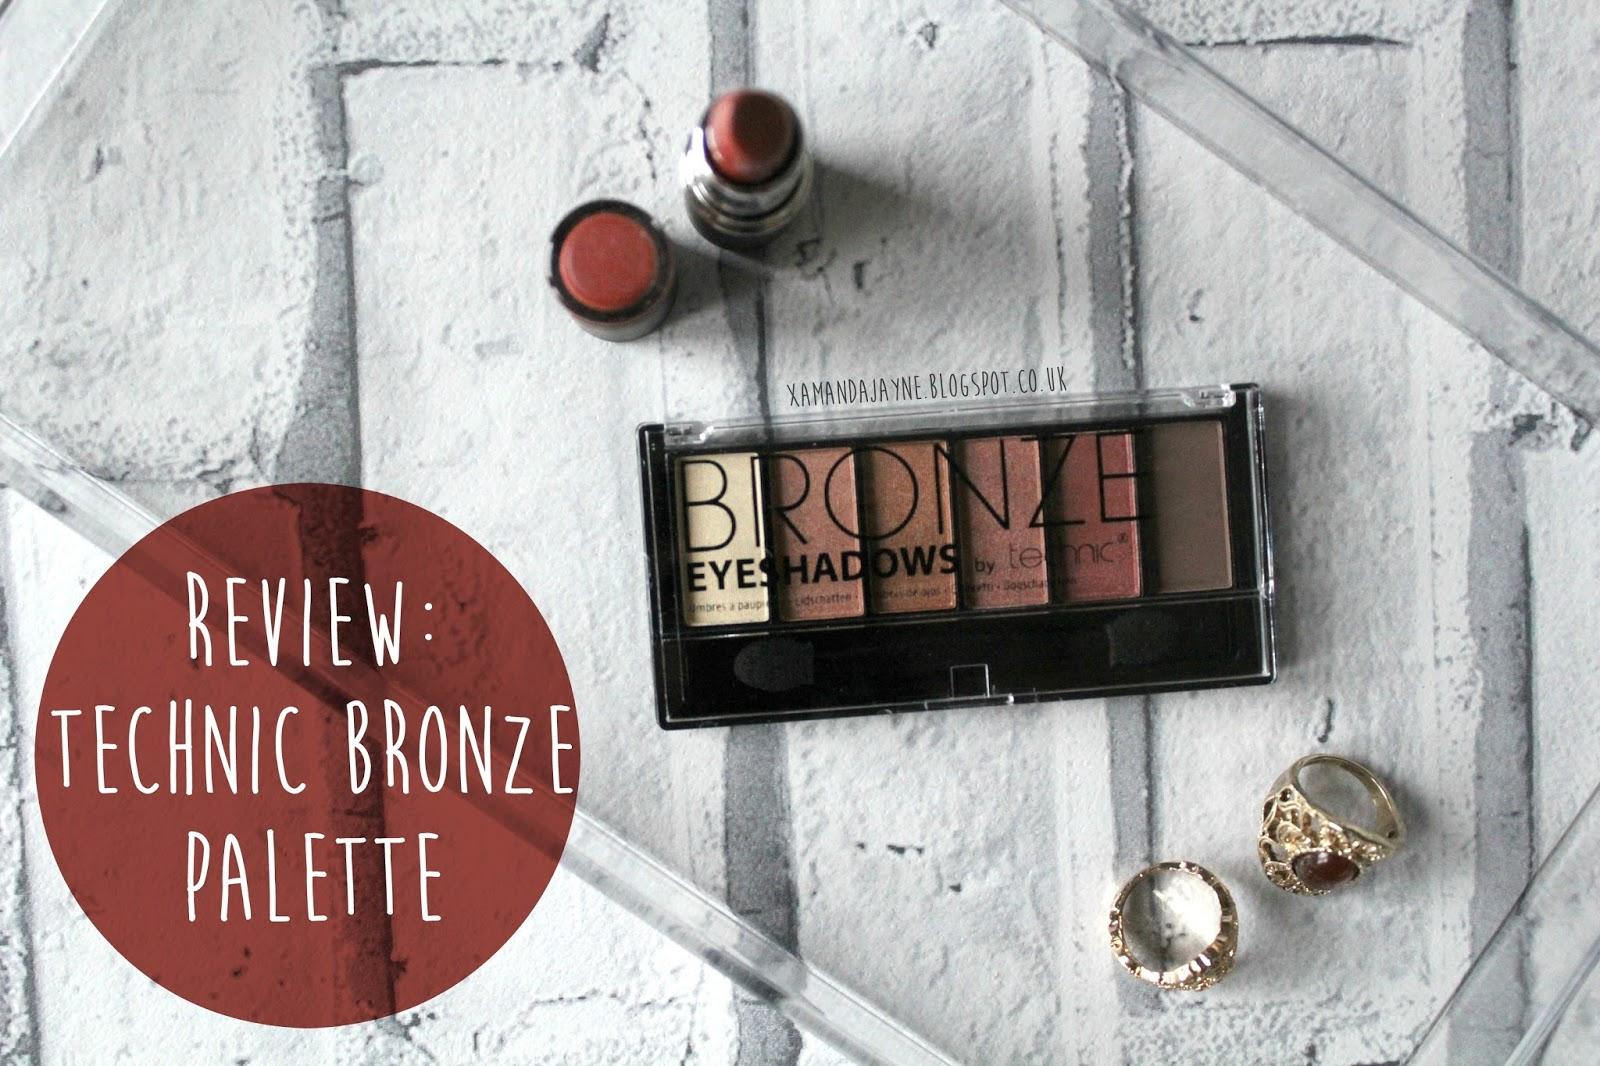 technic, budget, eyeshadow, drugstore, eyeshadow palette, review, swatches, bronze eyeshadow